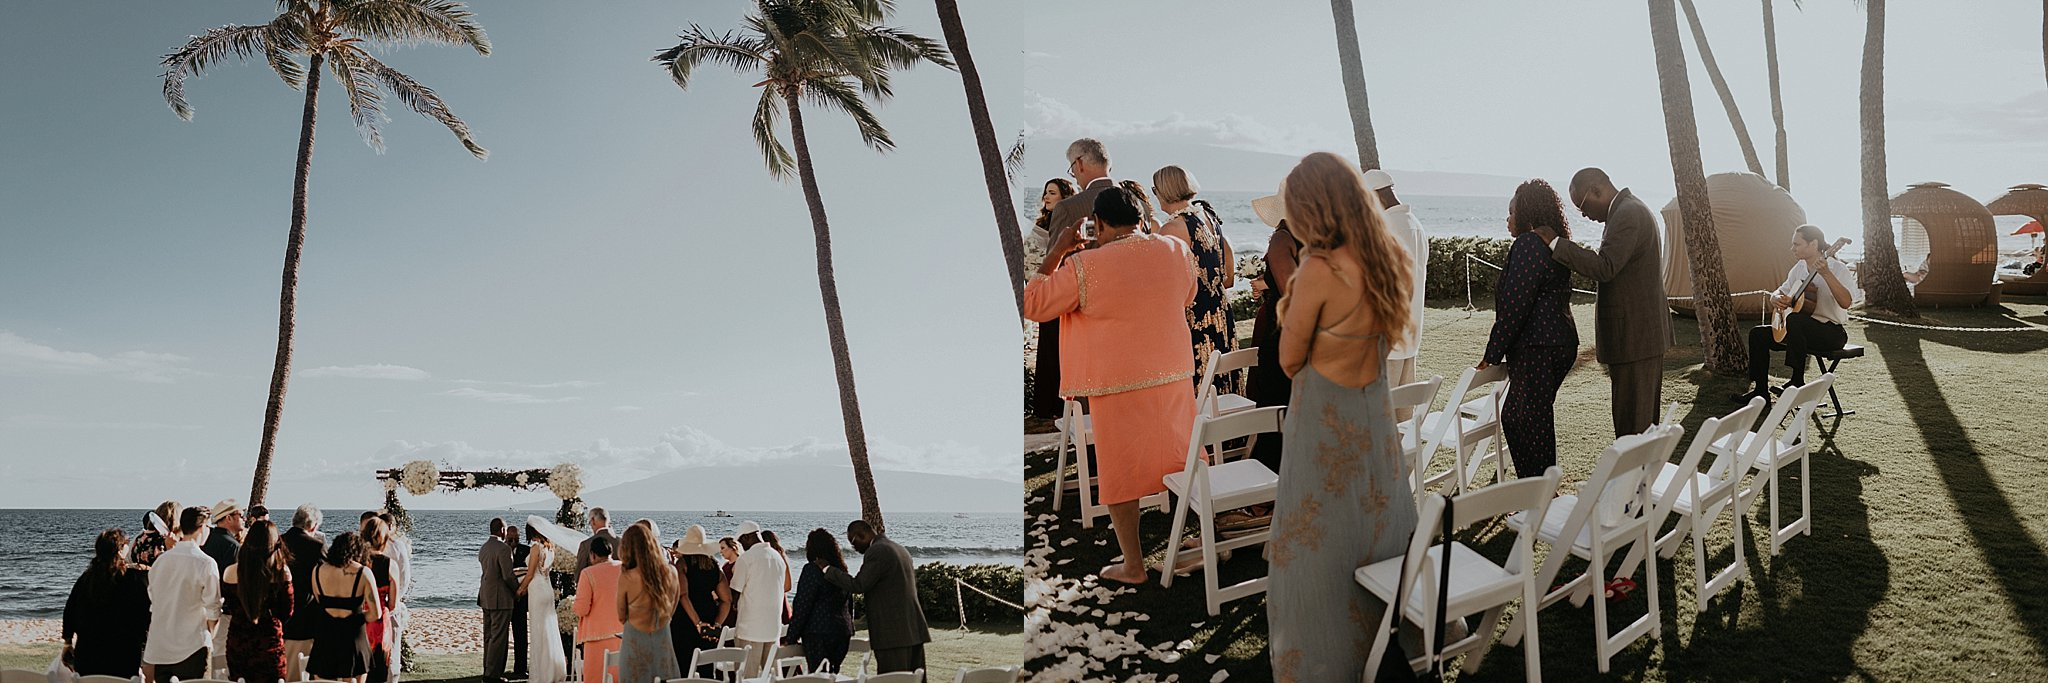 samantha_mcfarlen_bellingham_washington_engagement_photography_seattle_wedding_photographer_0214.jpg